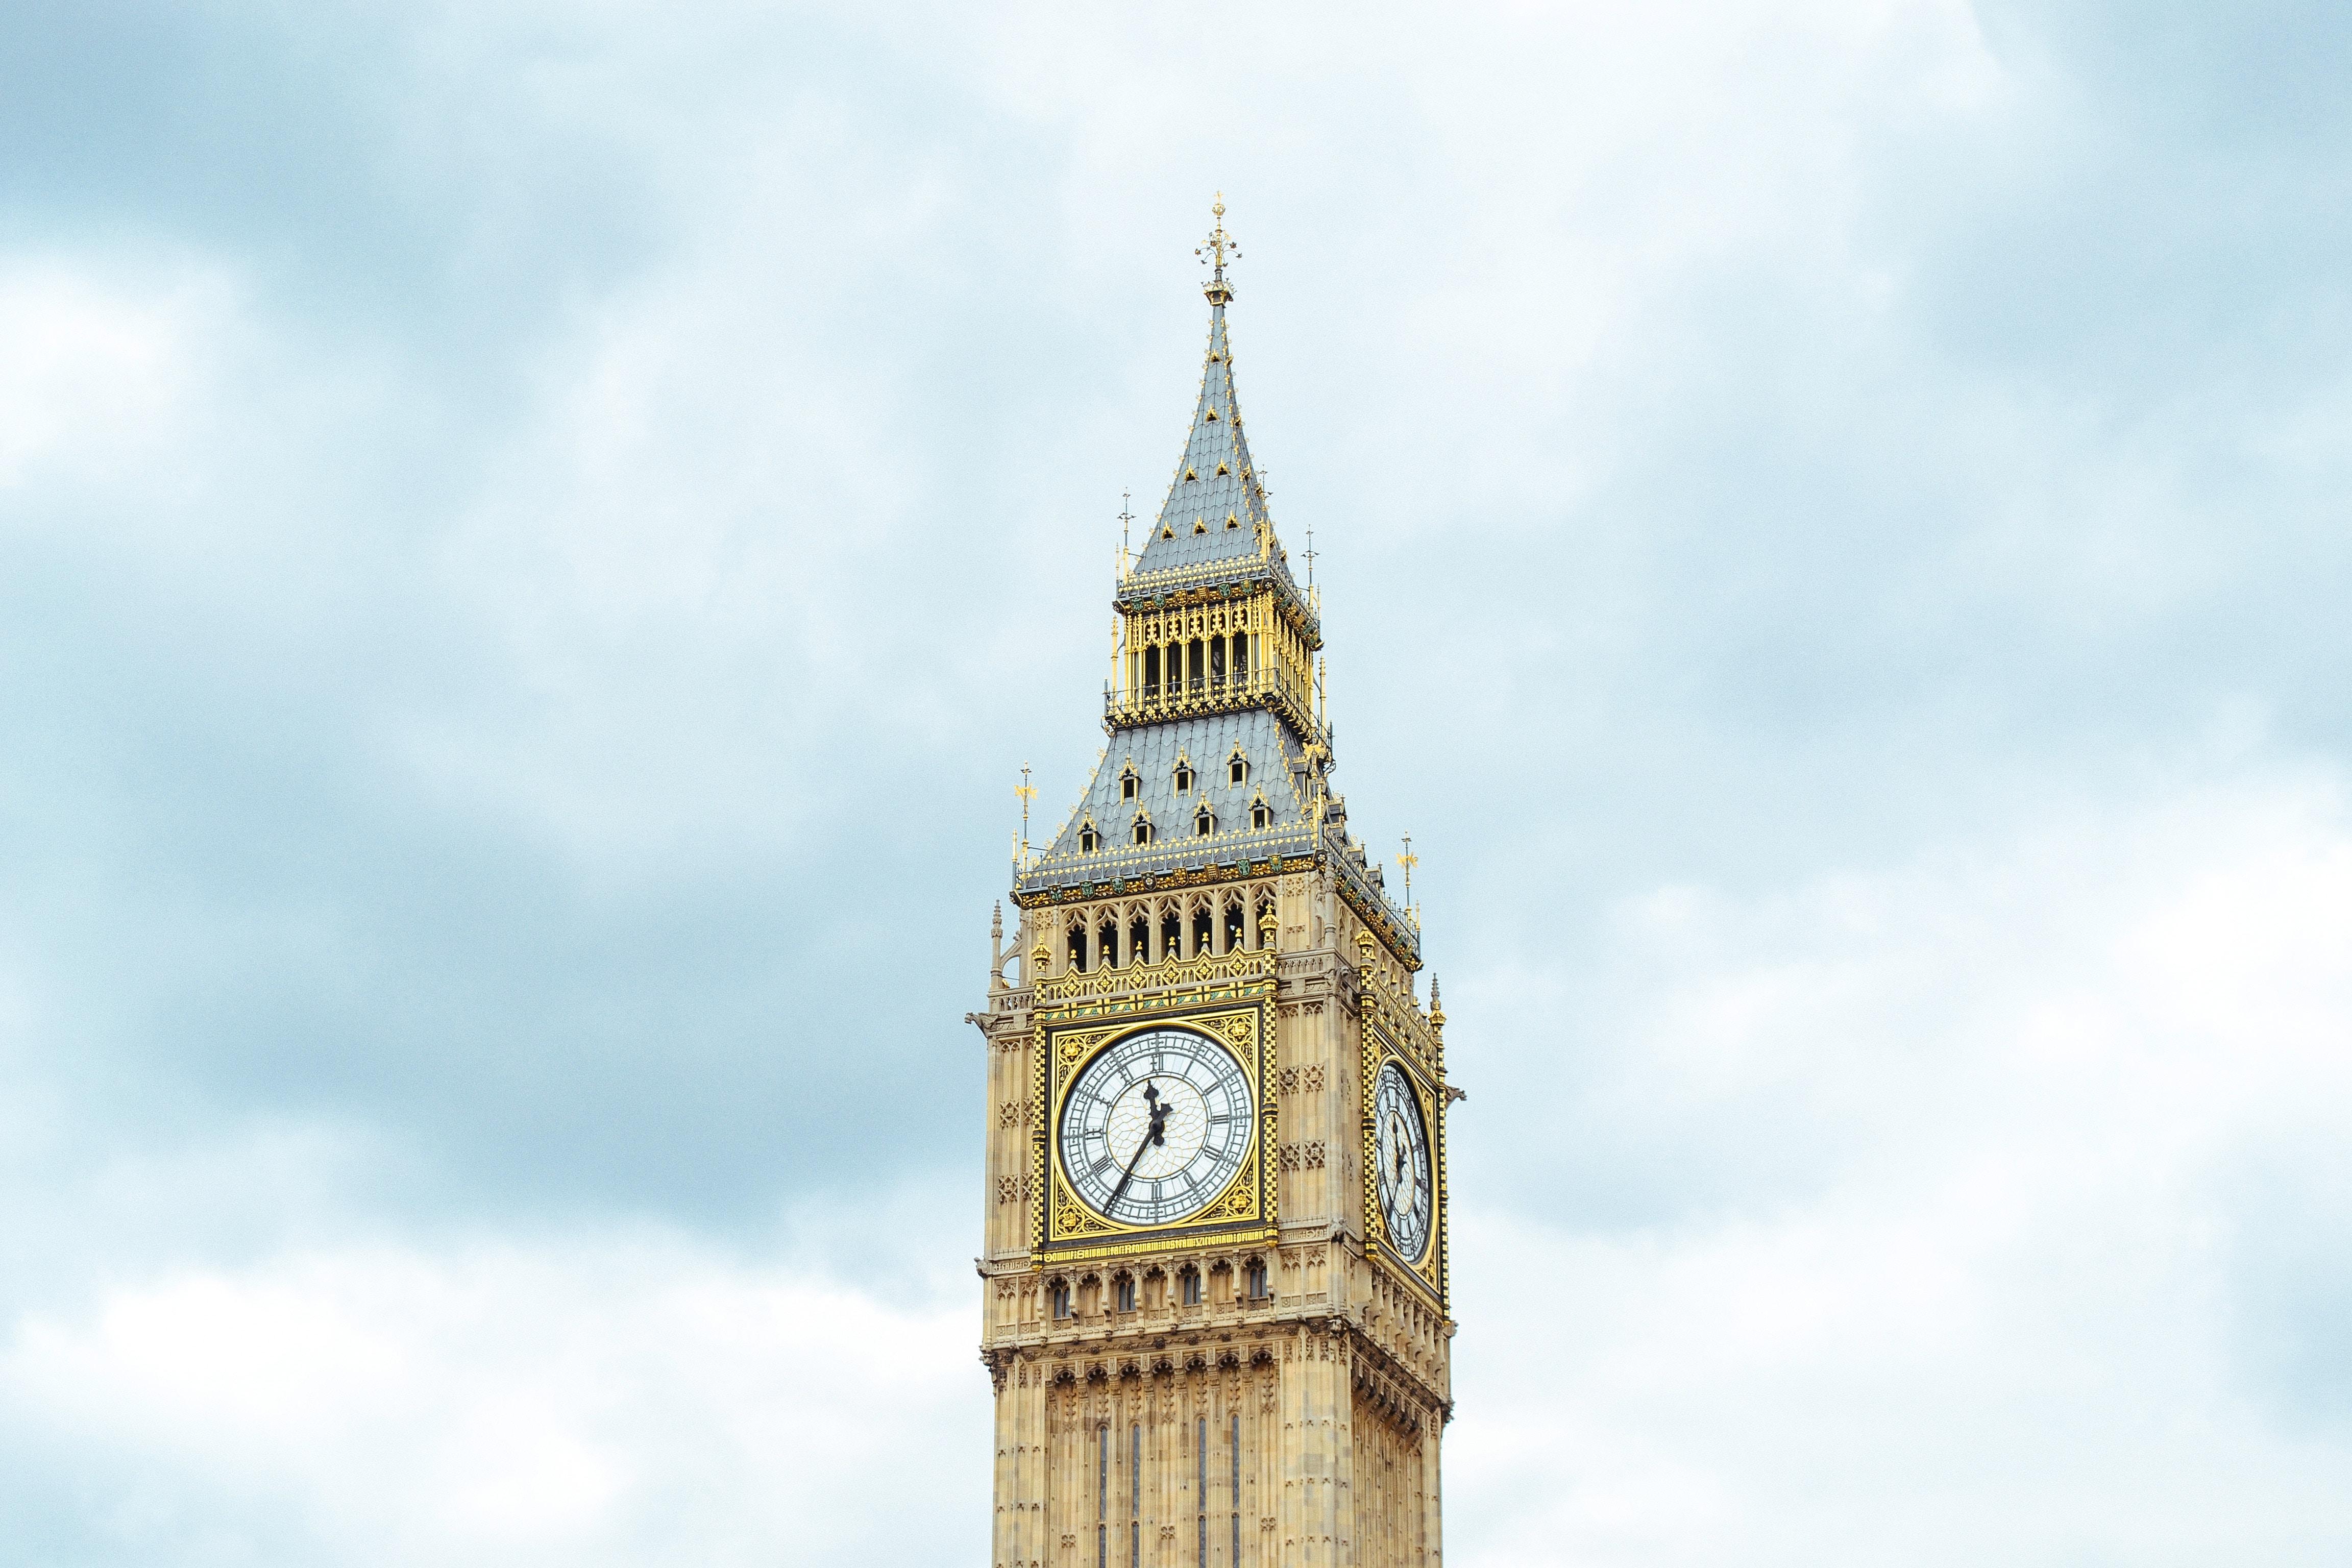 Elizabeth's Tower at 11:35 during daytime